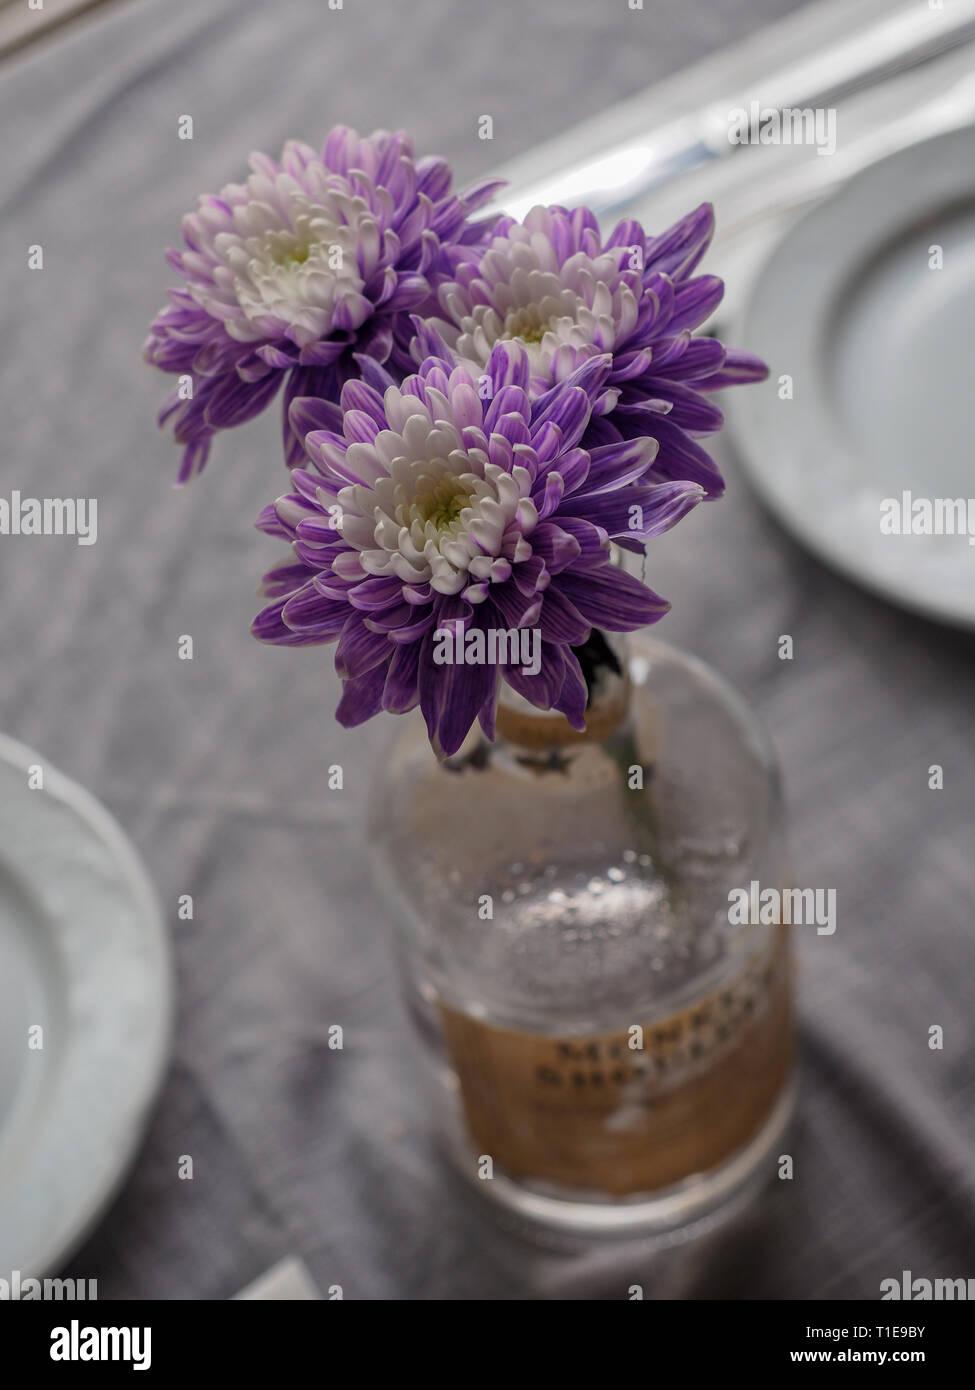 Dried flower potpourri - Stock Image